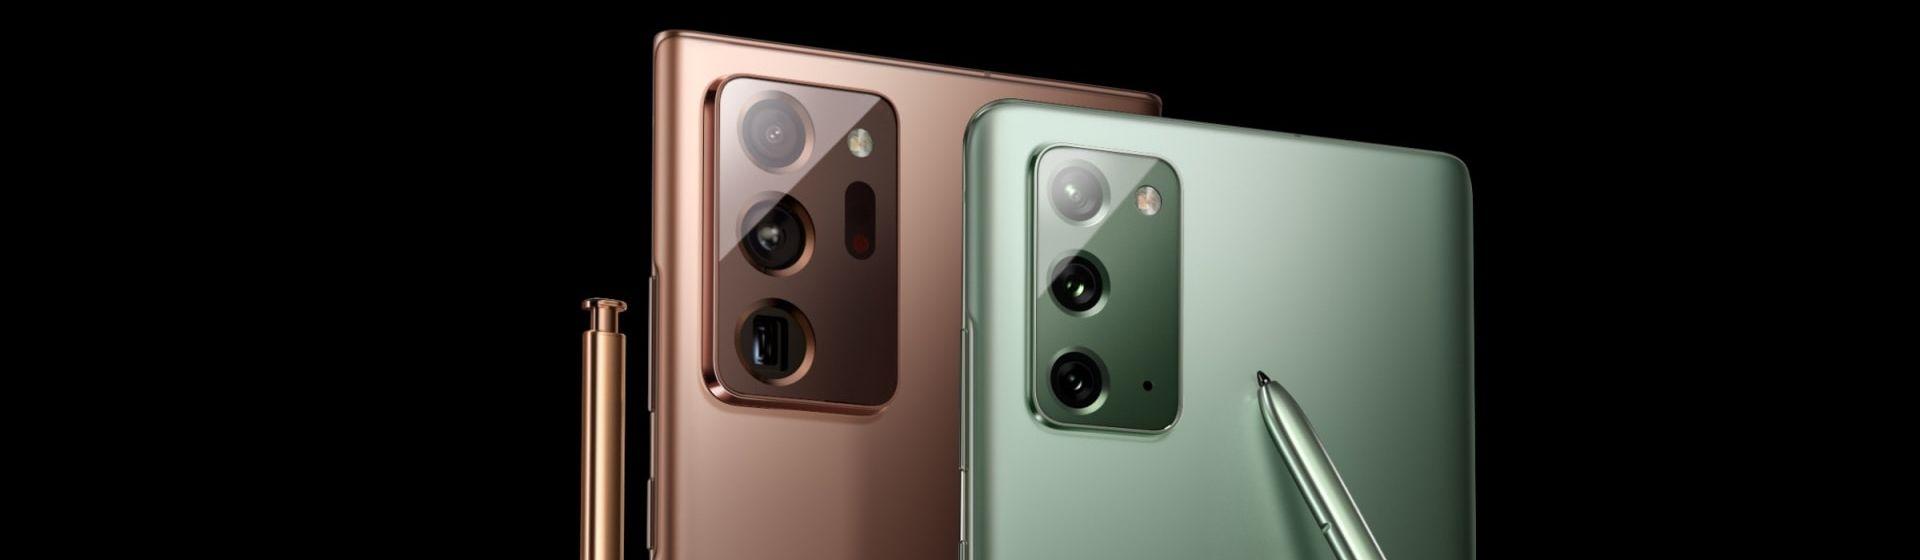 Galaxy Note 20 vs Note 20 Ultra: o que muda nos celulares Samsung?